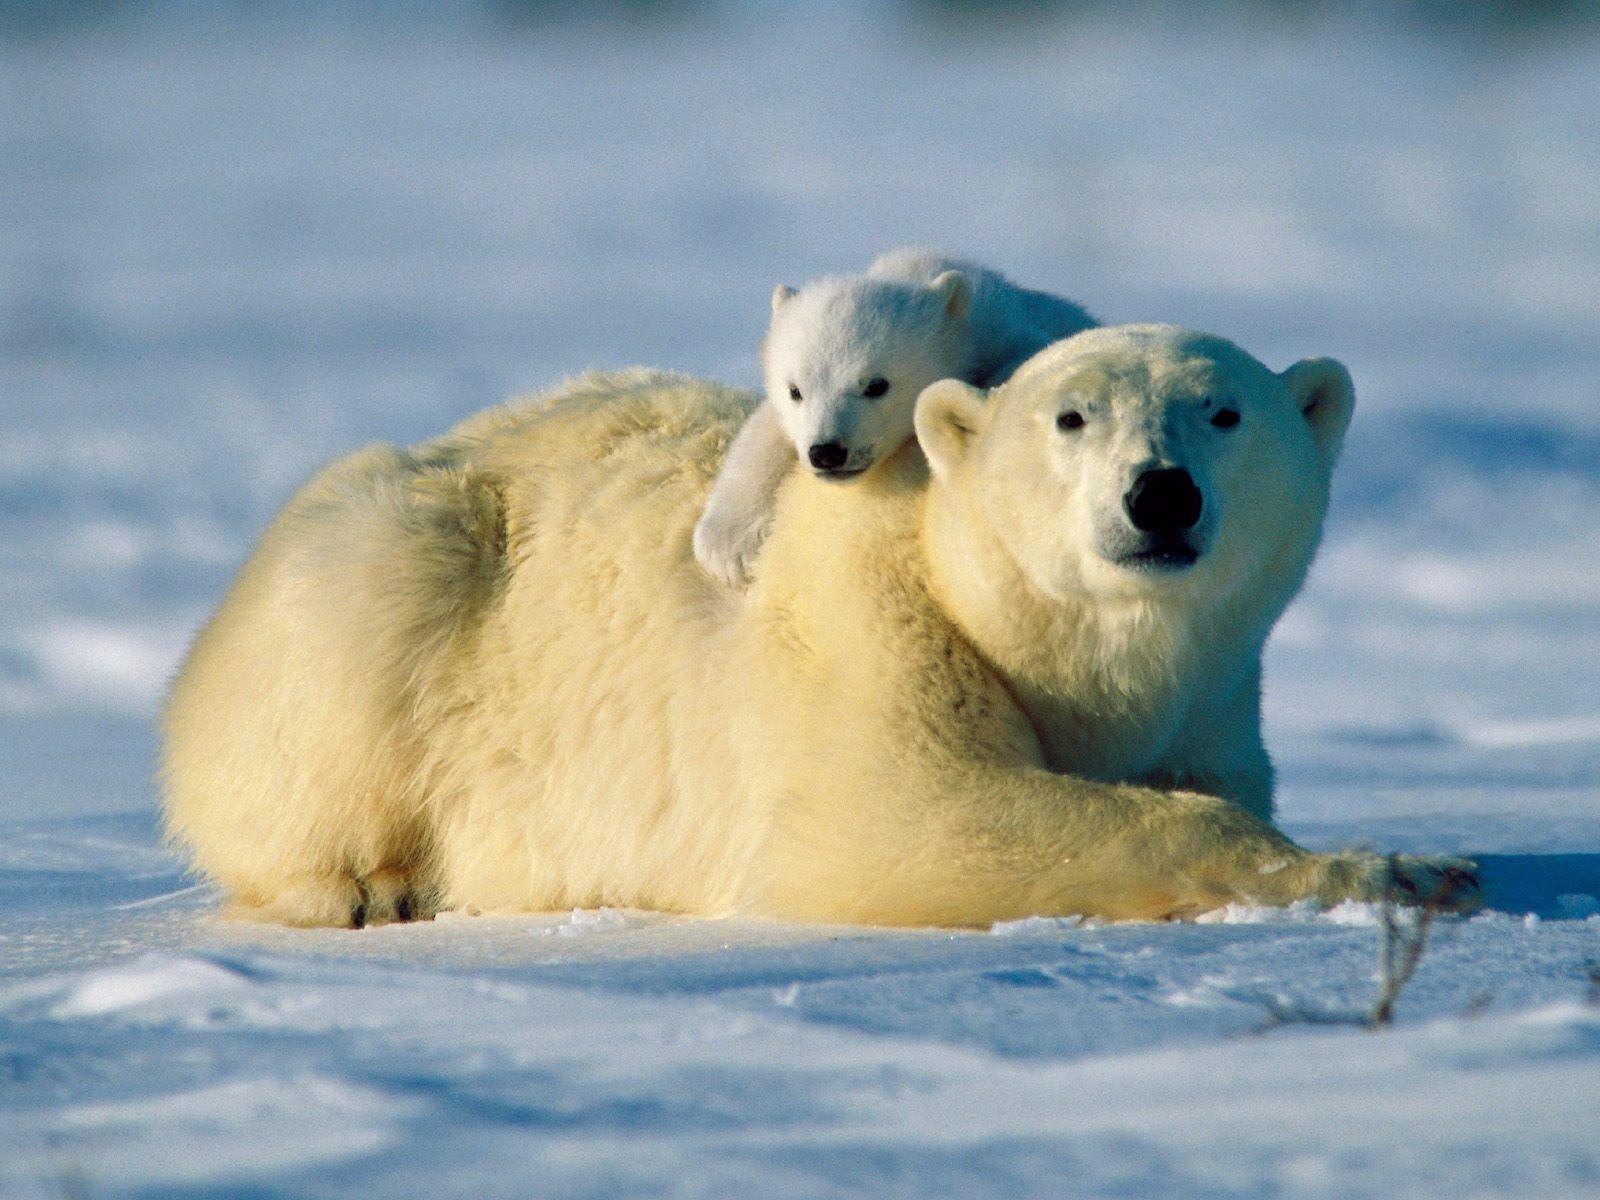 best Places to Visit images on Pinterest Polar bear Bear